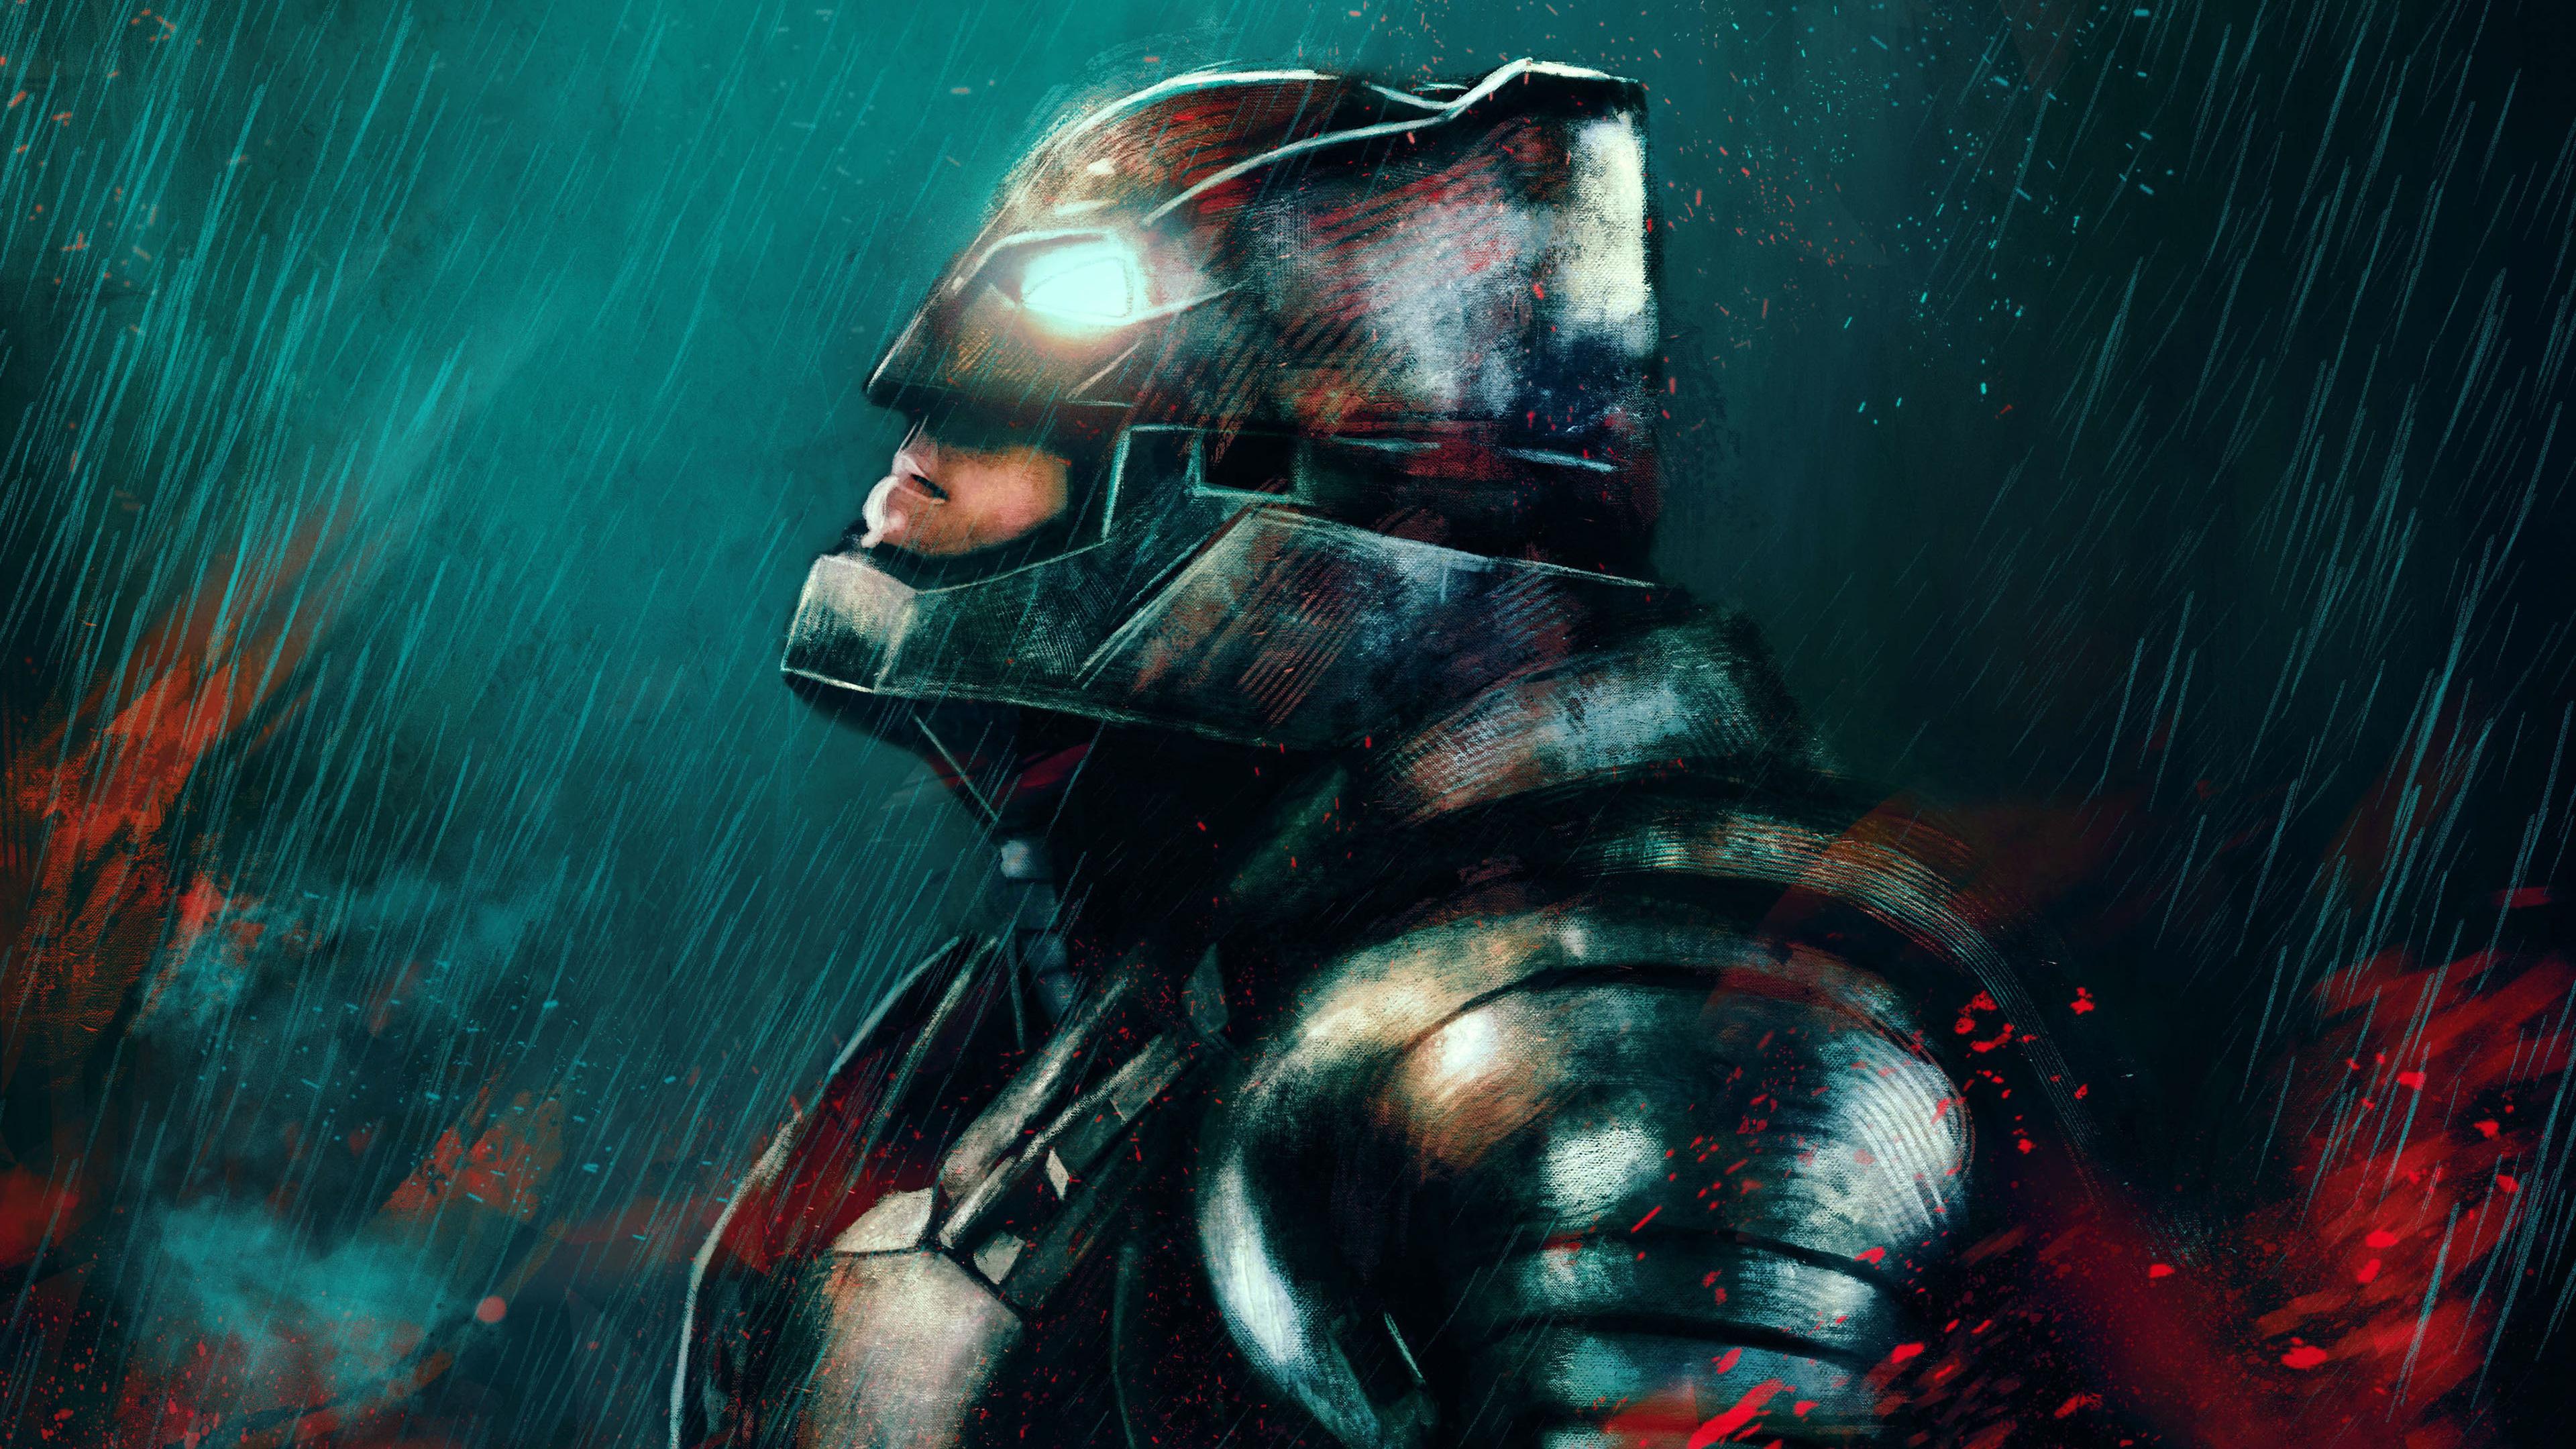 the dark knight art 1536523546 - The Dark Knight Art - superheroes wallpapers, hd-wallpapers, digital art wallpapers, behance wallpapers, batman wallpapers, artwork wallpapers, artist wallpapers, 4k-wallpapers